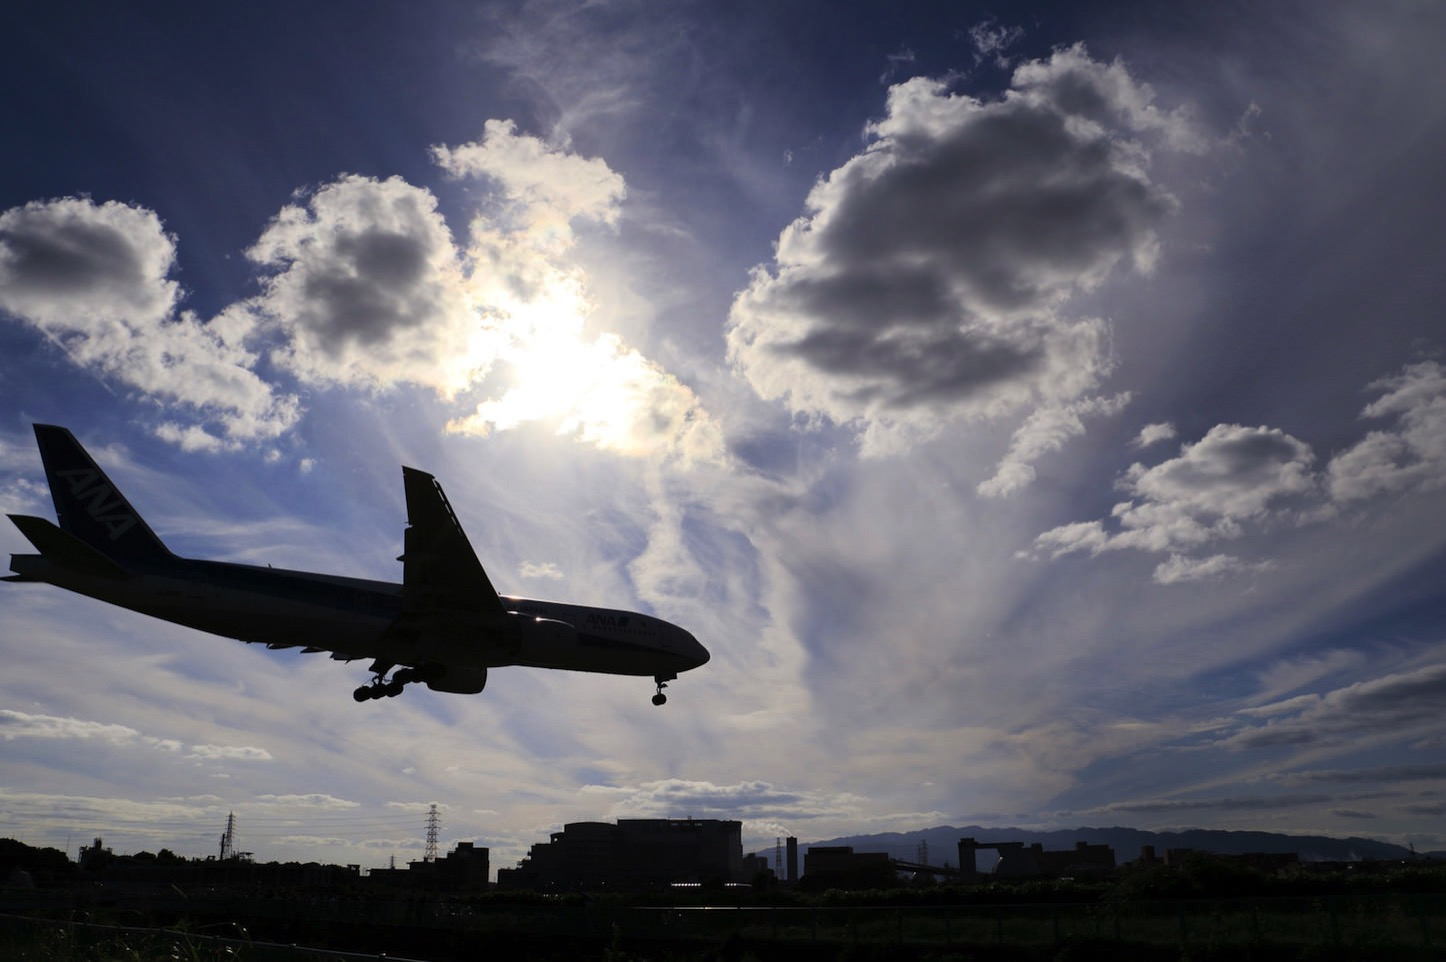 Airplane-Pakutaso.jpg